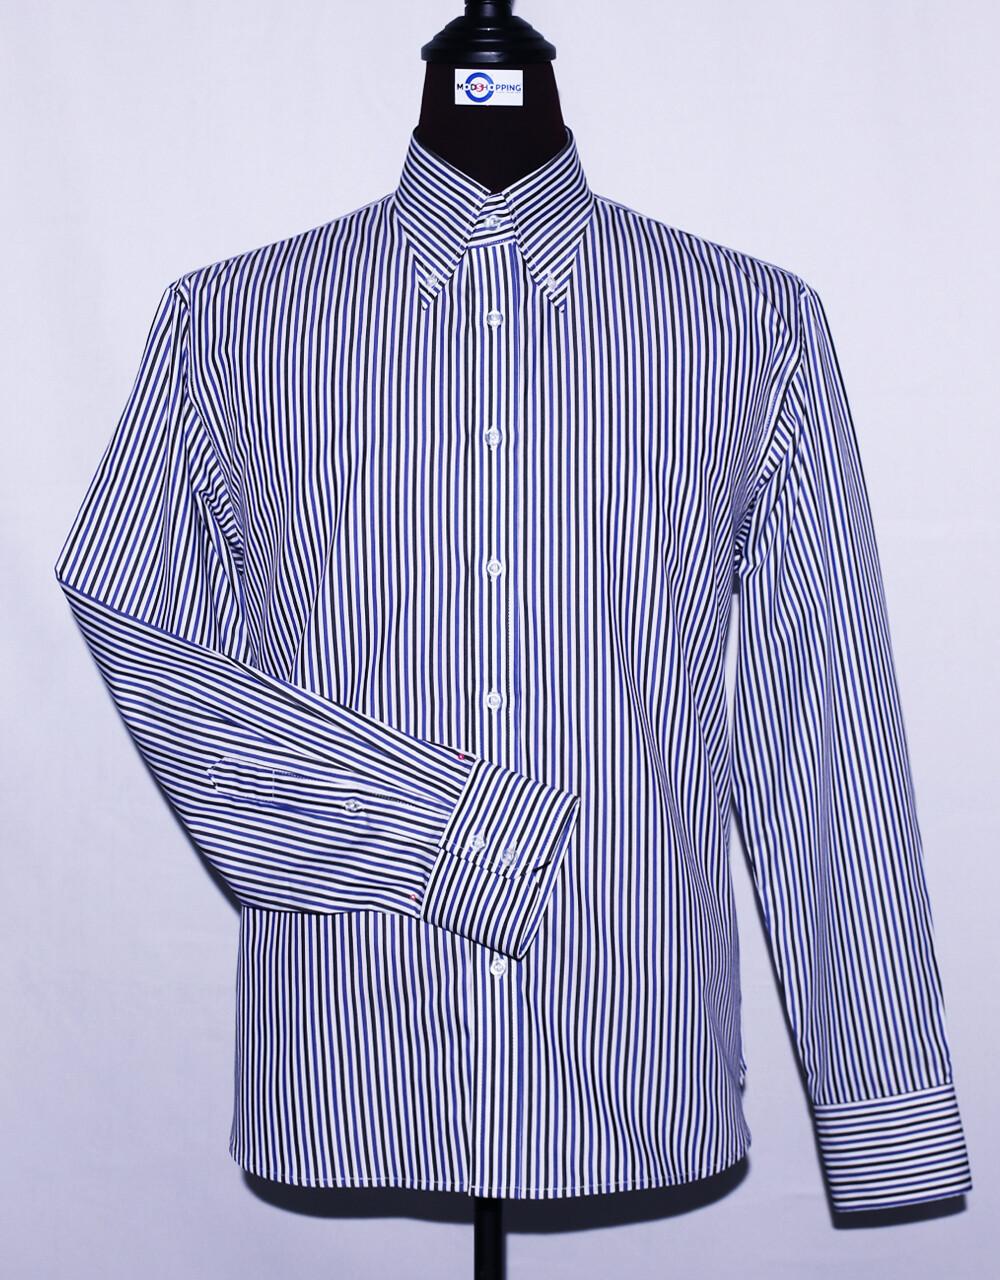 Black, White, And Blue Striped Dress Mens Shirt